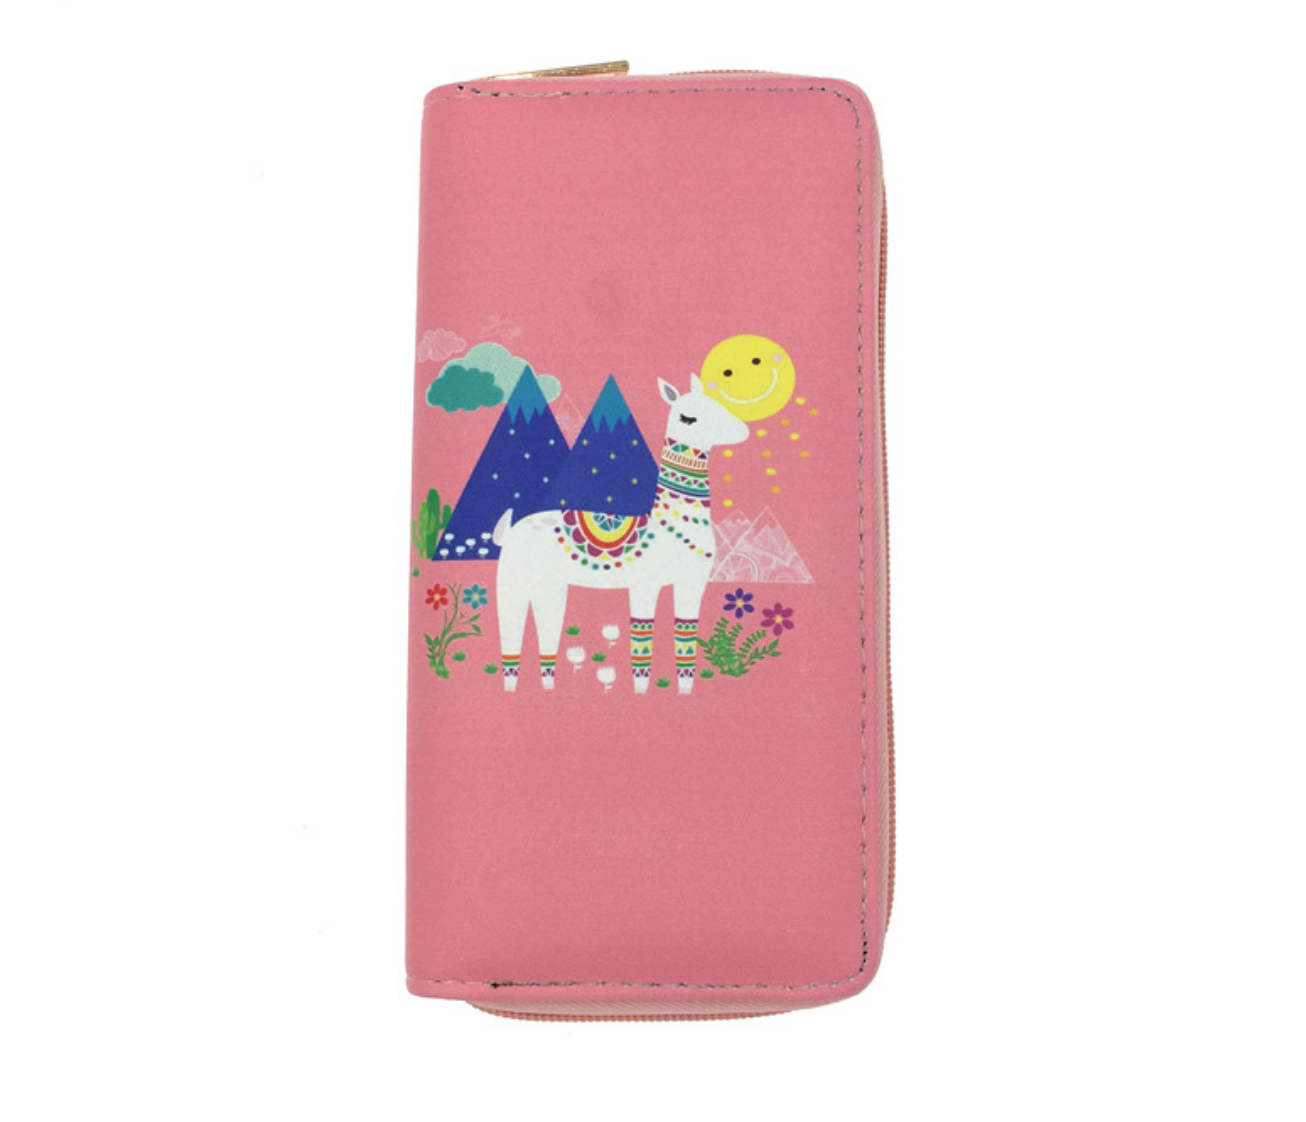 JR-198 Llama Mountain Wallet